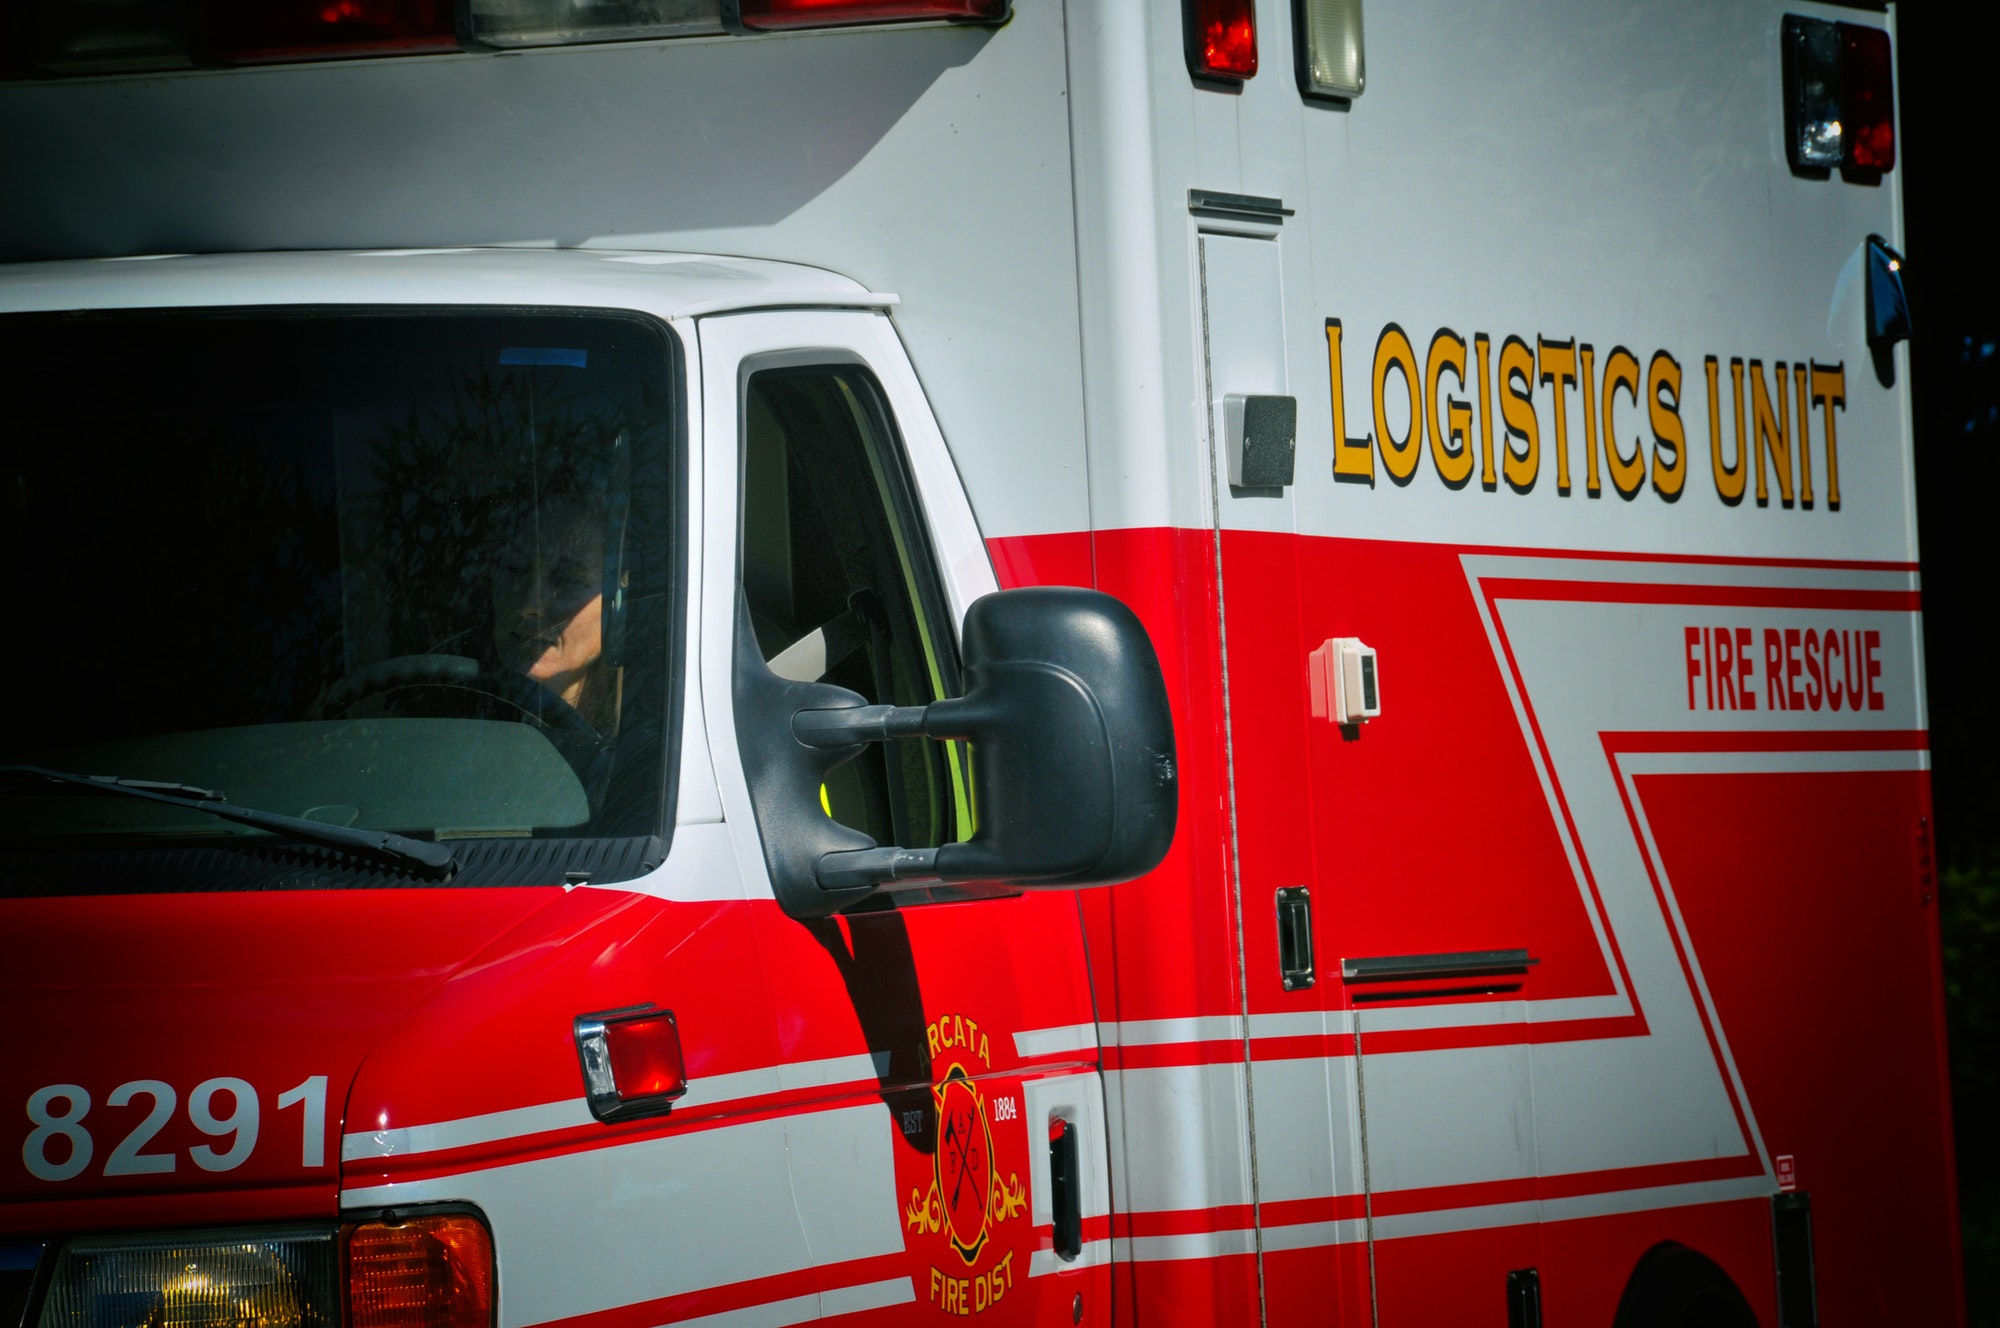 Current photo of Logistics unit 8291.